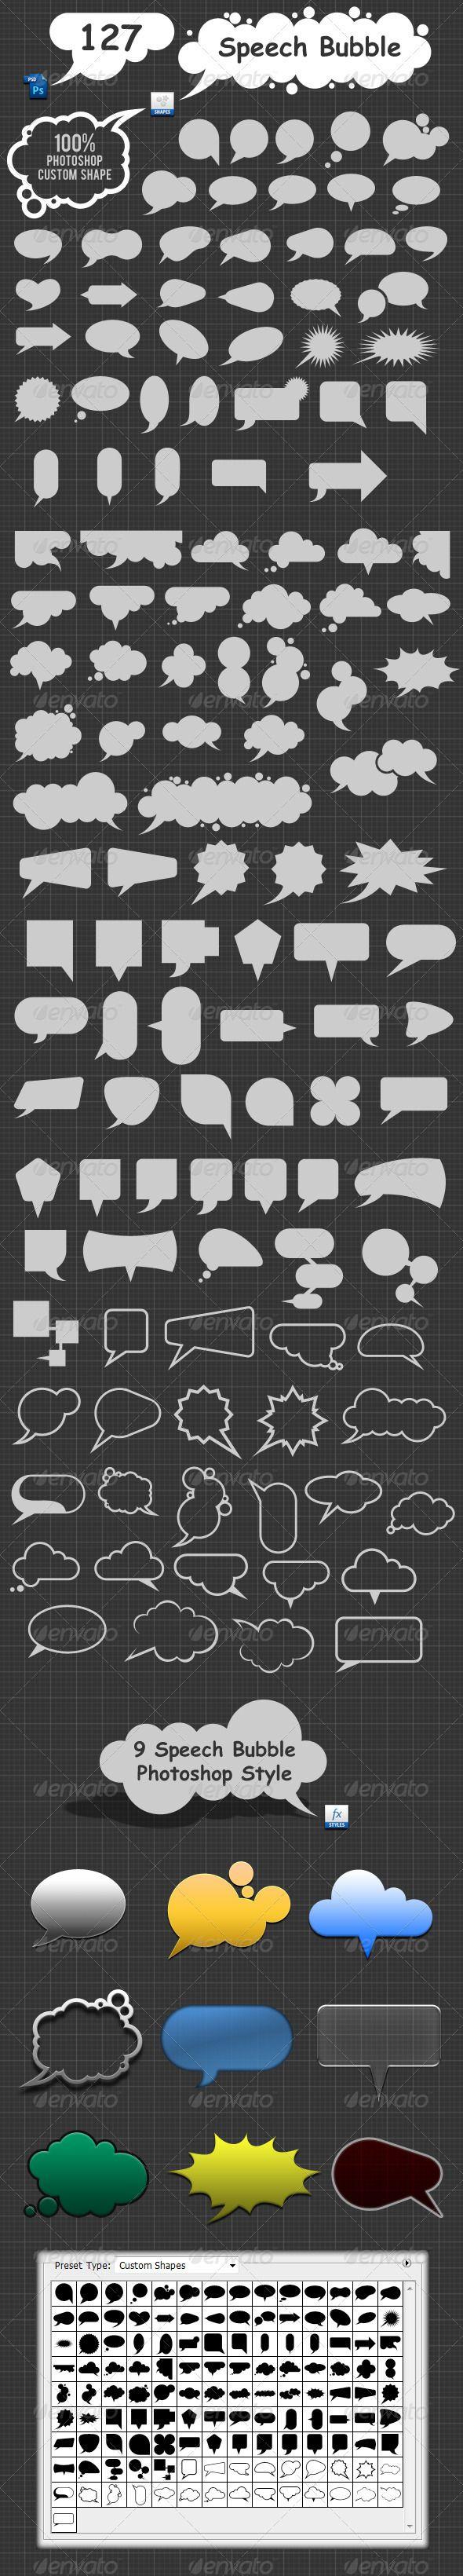 127 Speech Bubble Photoshop Custom Shapes - GraphicRiver Item for Sale